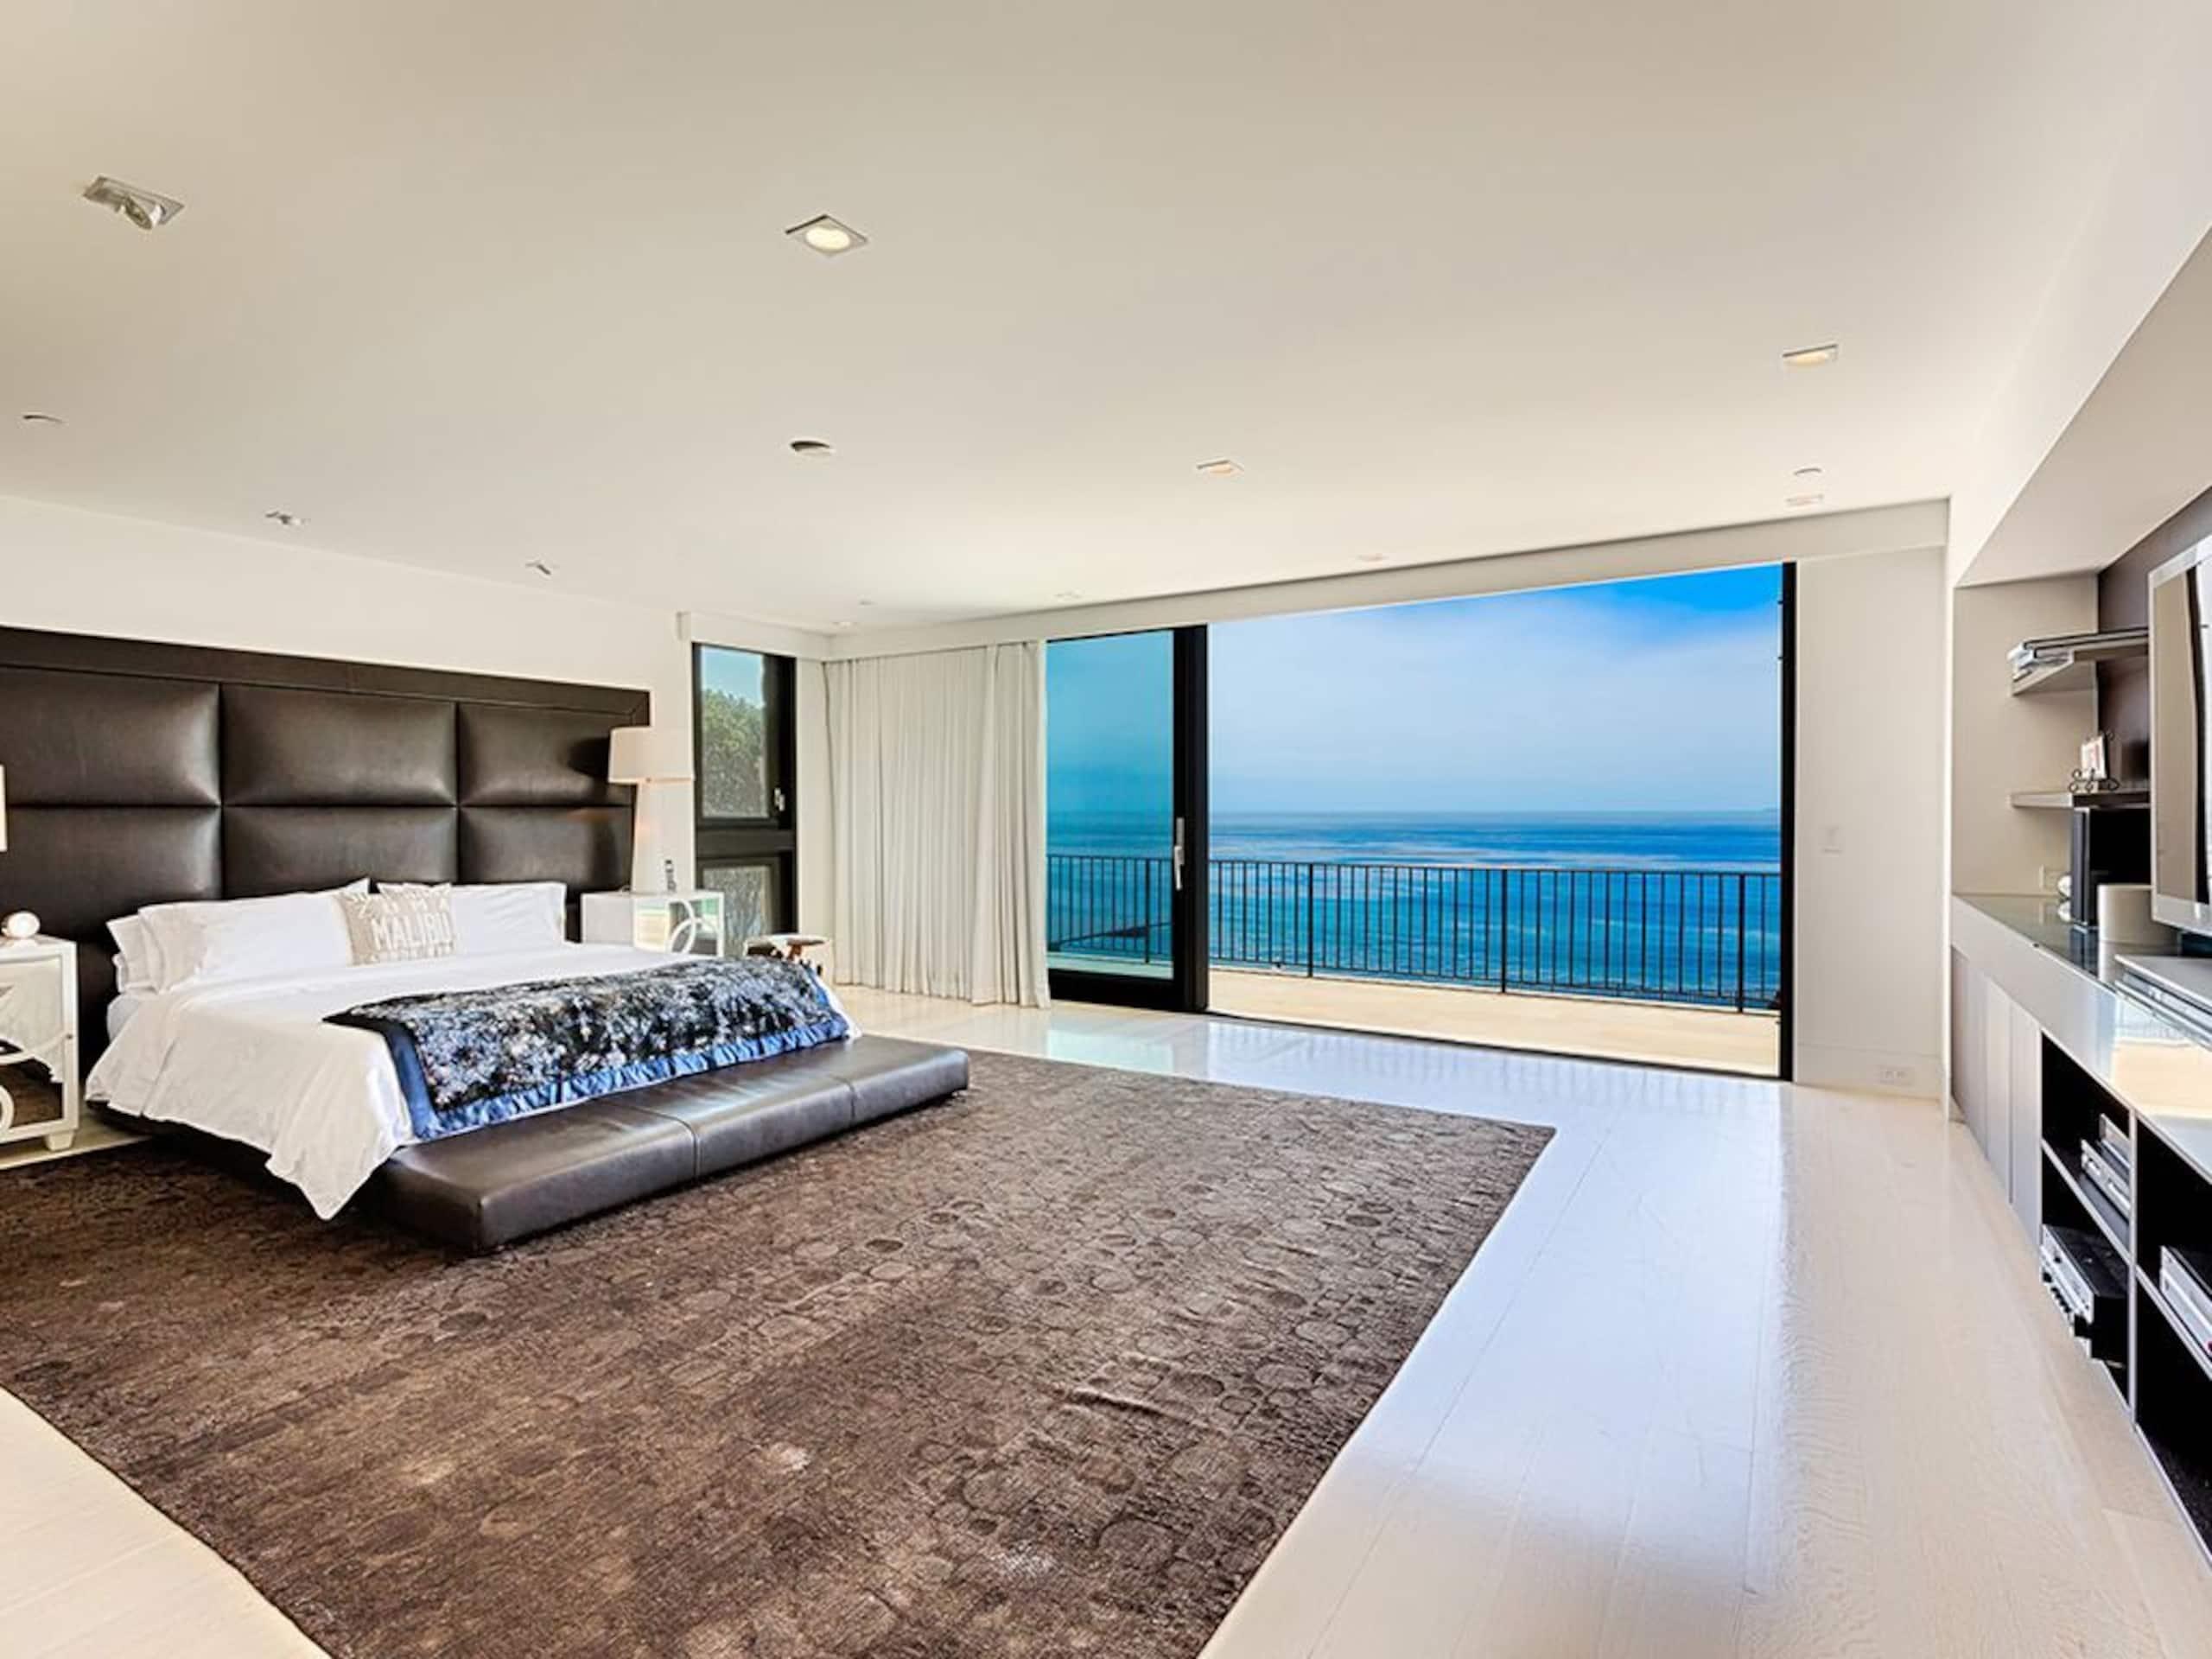 Apartment Villa Camden with Infinity Pool  Lawn  Gardens photo 20329251